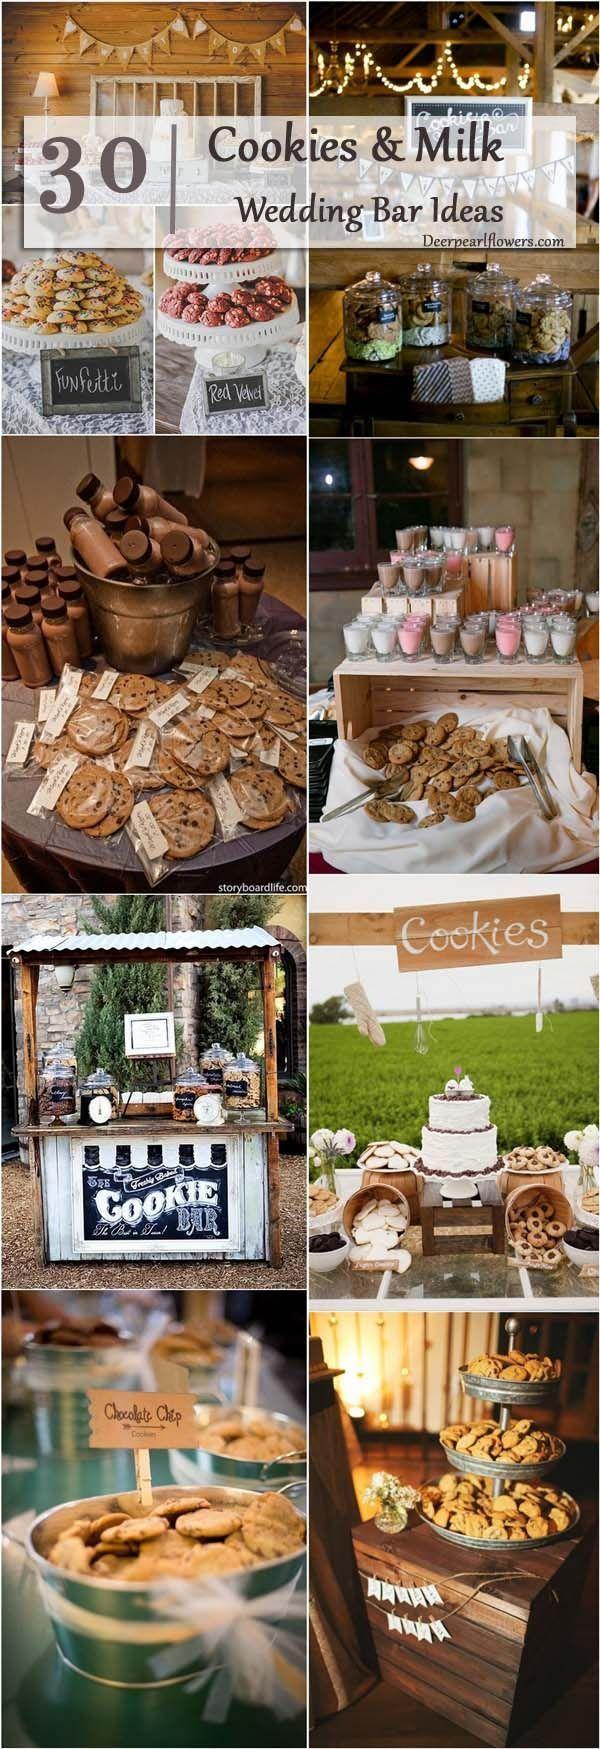 rustic country cookies smores bar /  / http://www.deerpearlflowers.com/wedding-smore-cookies-milk-bar-ideas/